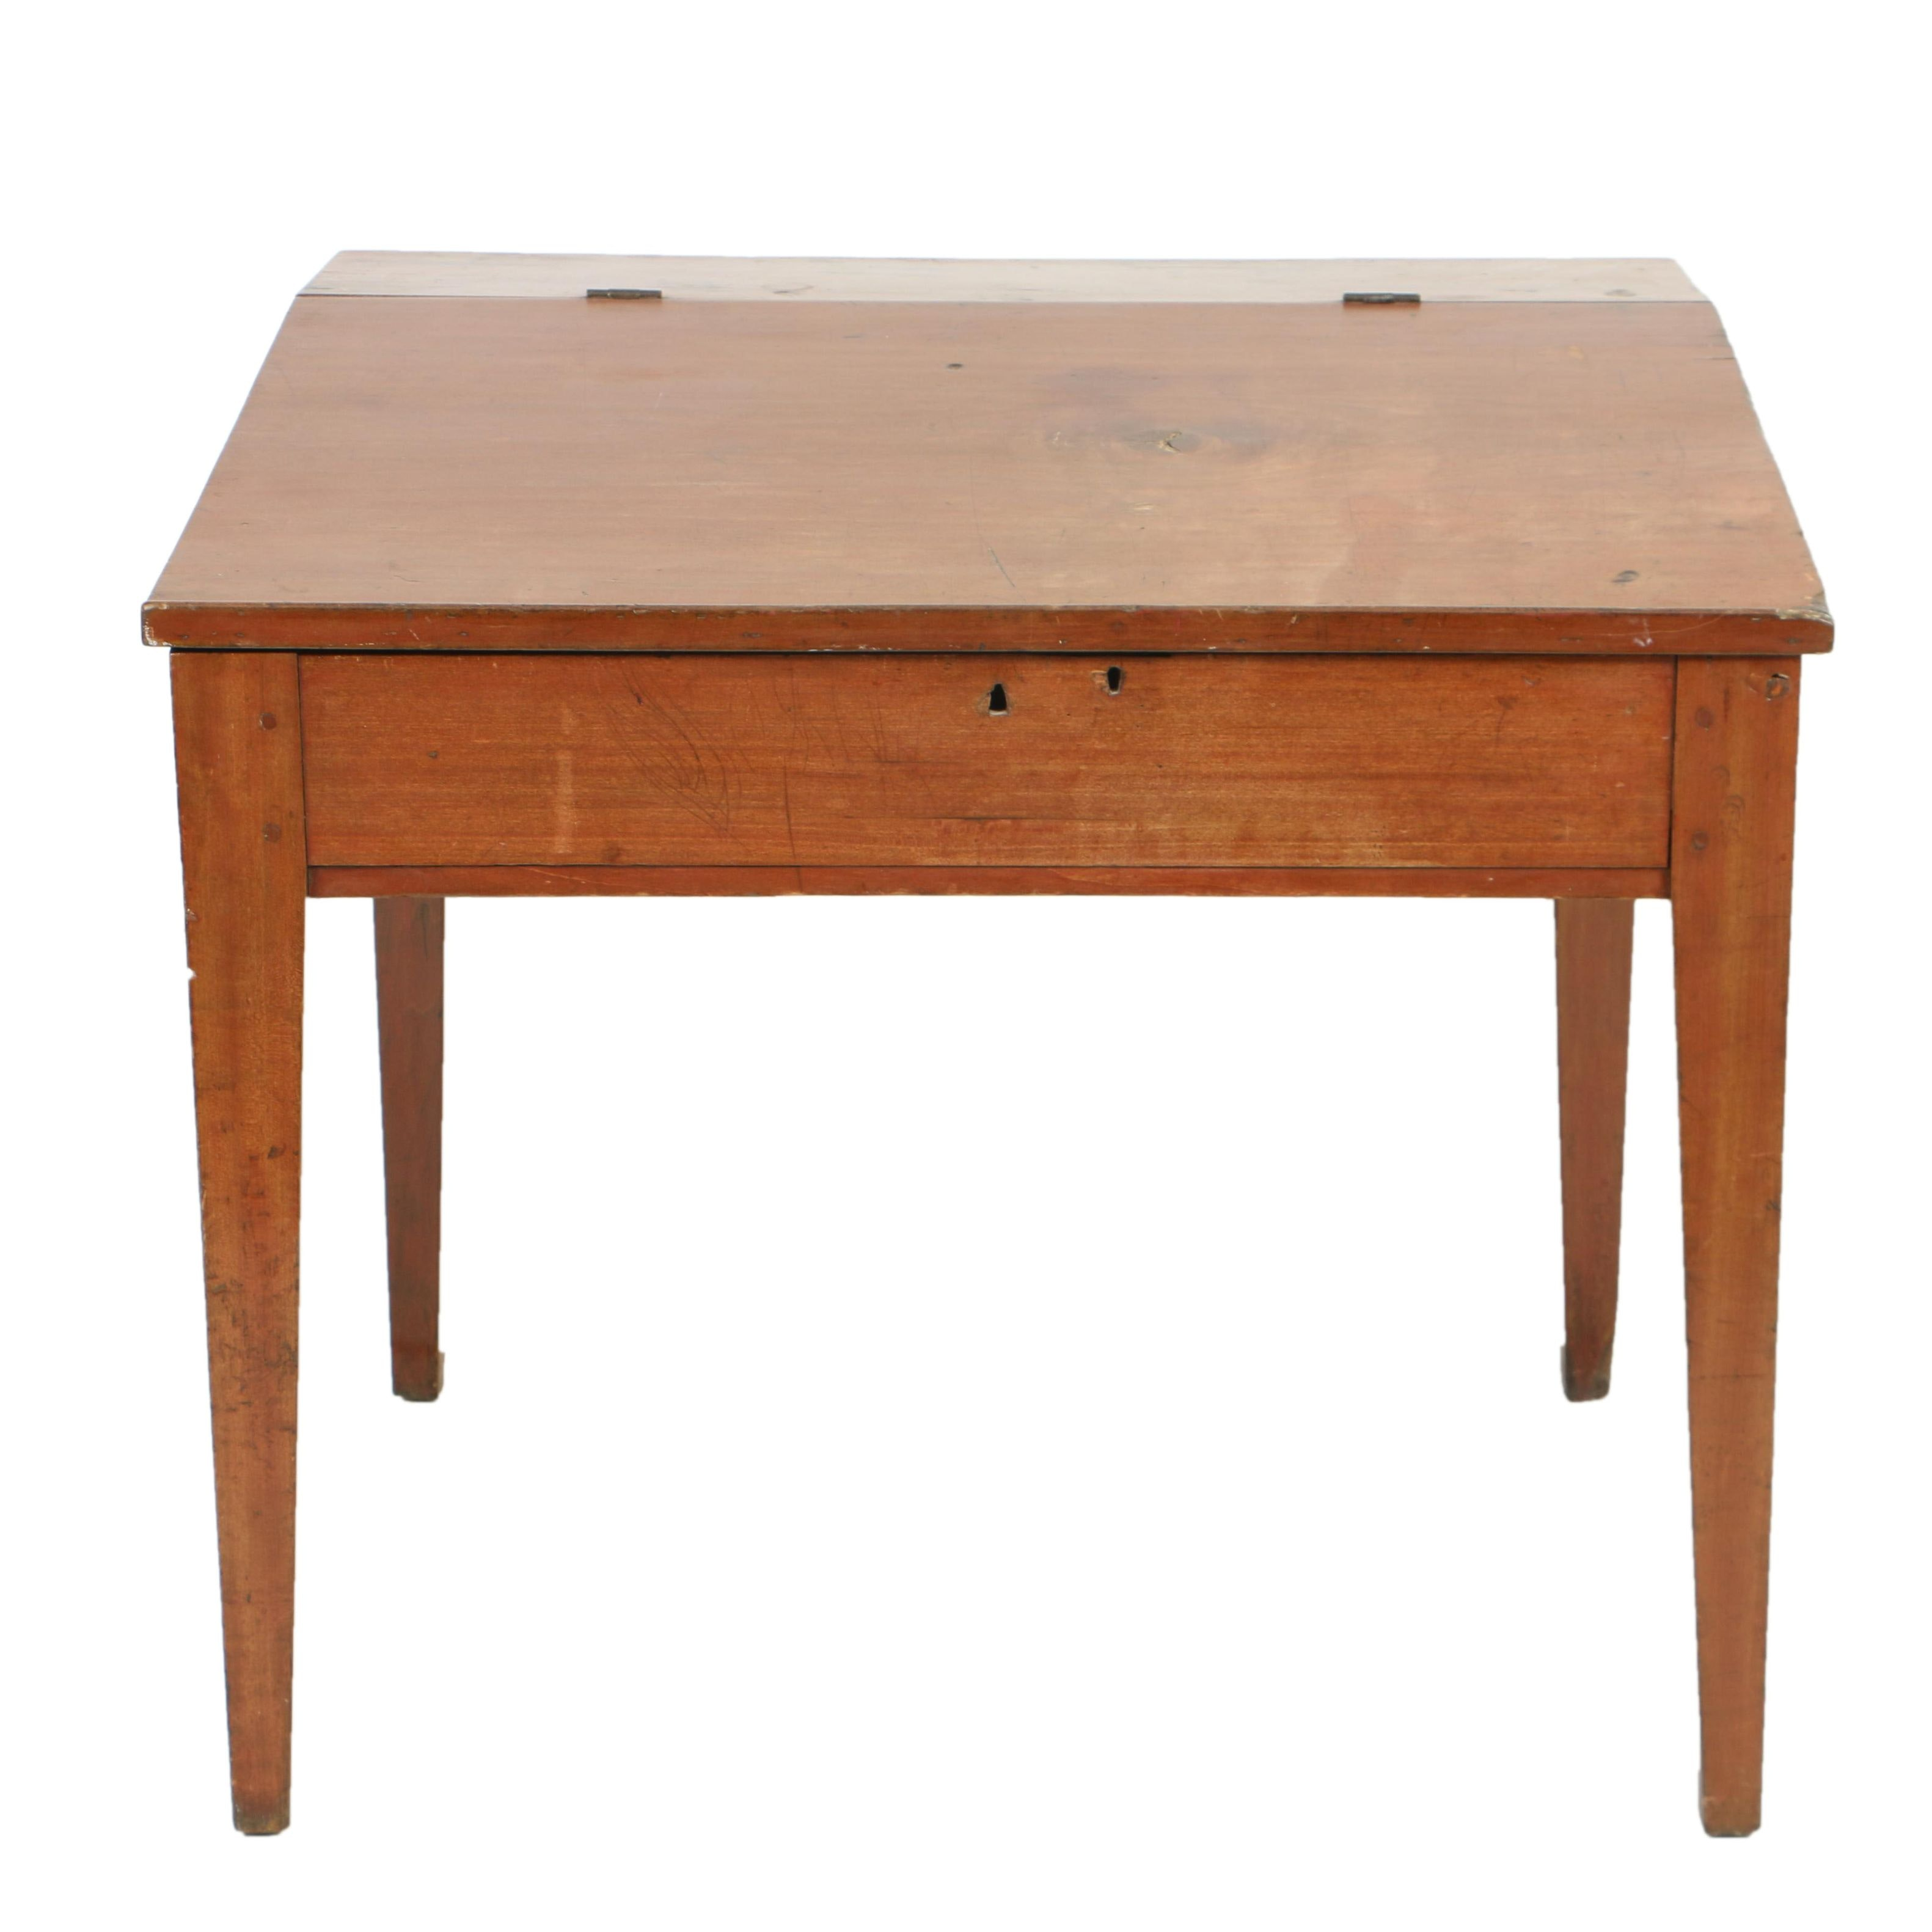 Antique Poplar Schoolmaster's Desk, Circa Second Quarter 19th Century